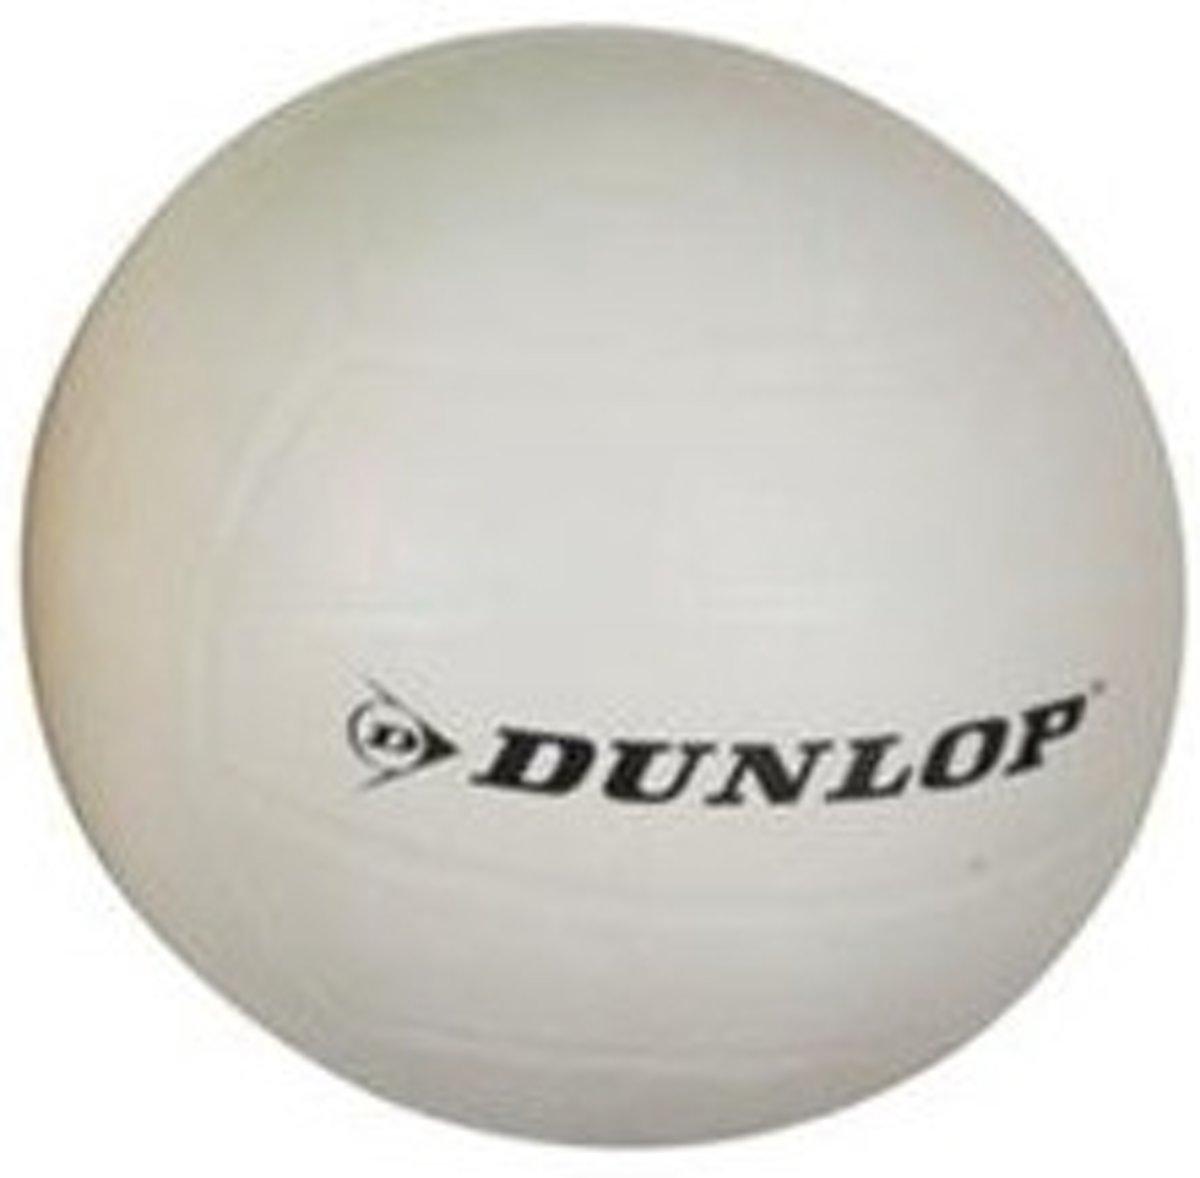 Dunlop Volleybal Rubber Maat 5 Wit kopen